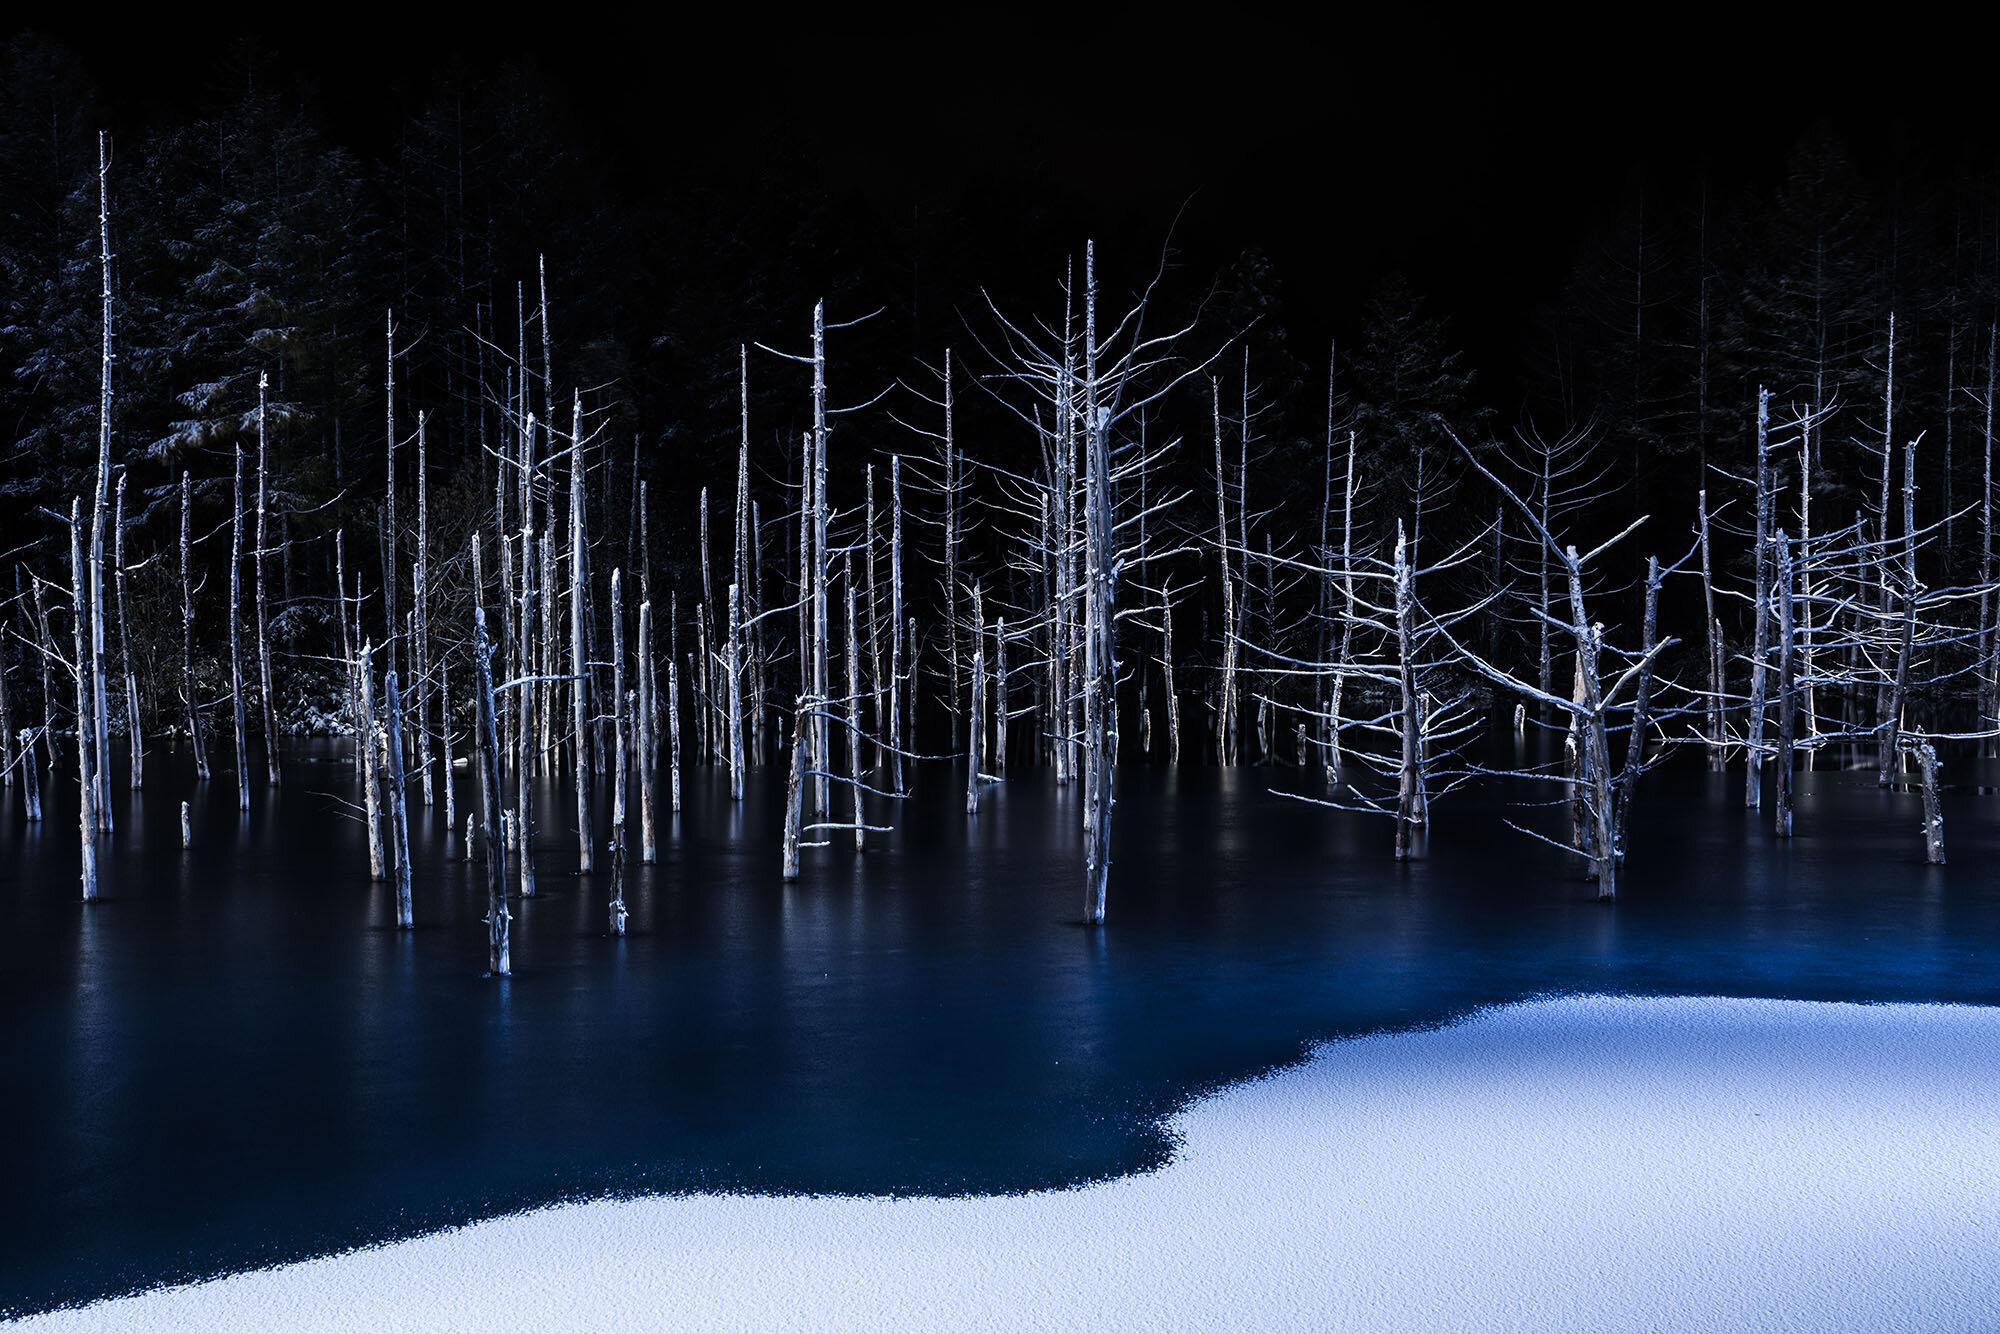 190283_206440_5_ © Hiroshi Tanita, Japan, Winner, Open Competition, Nature, 2017 Sony World Photography Awards.jpg